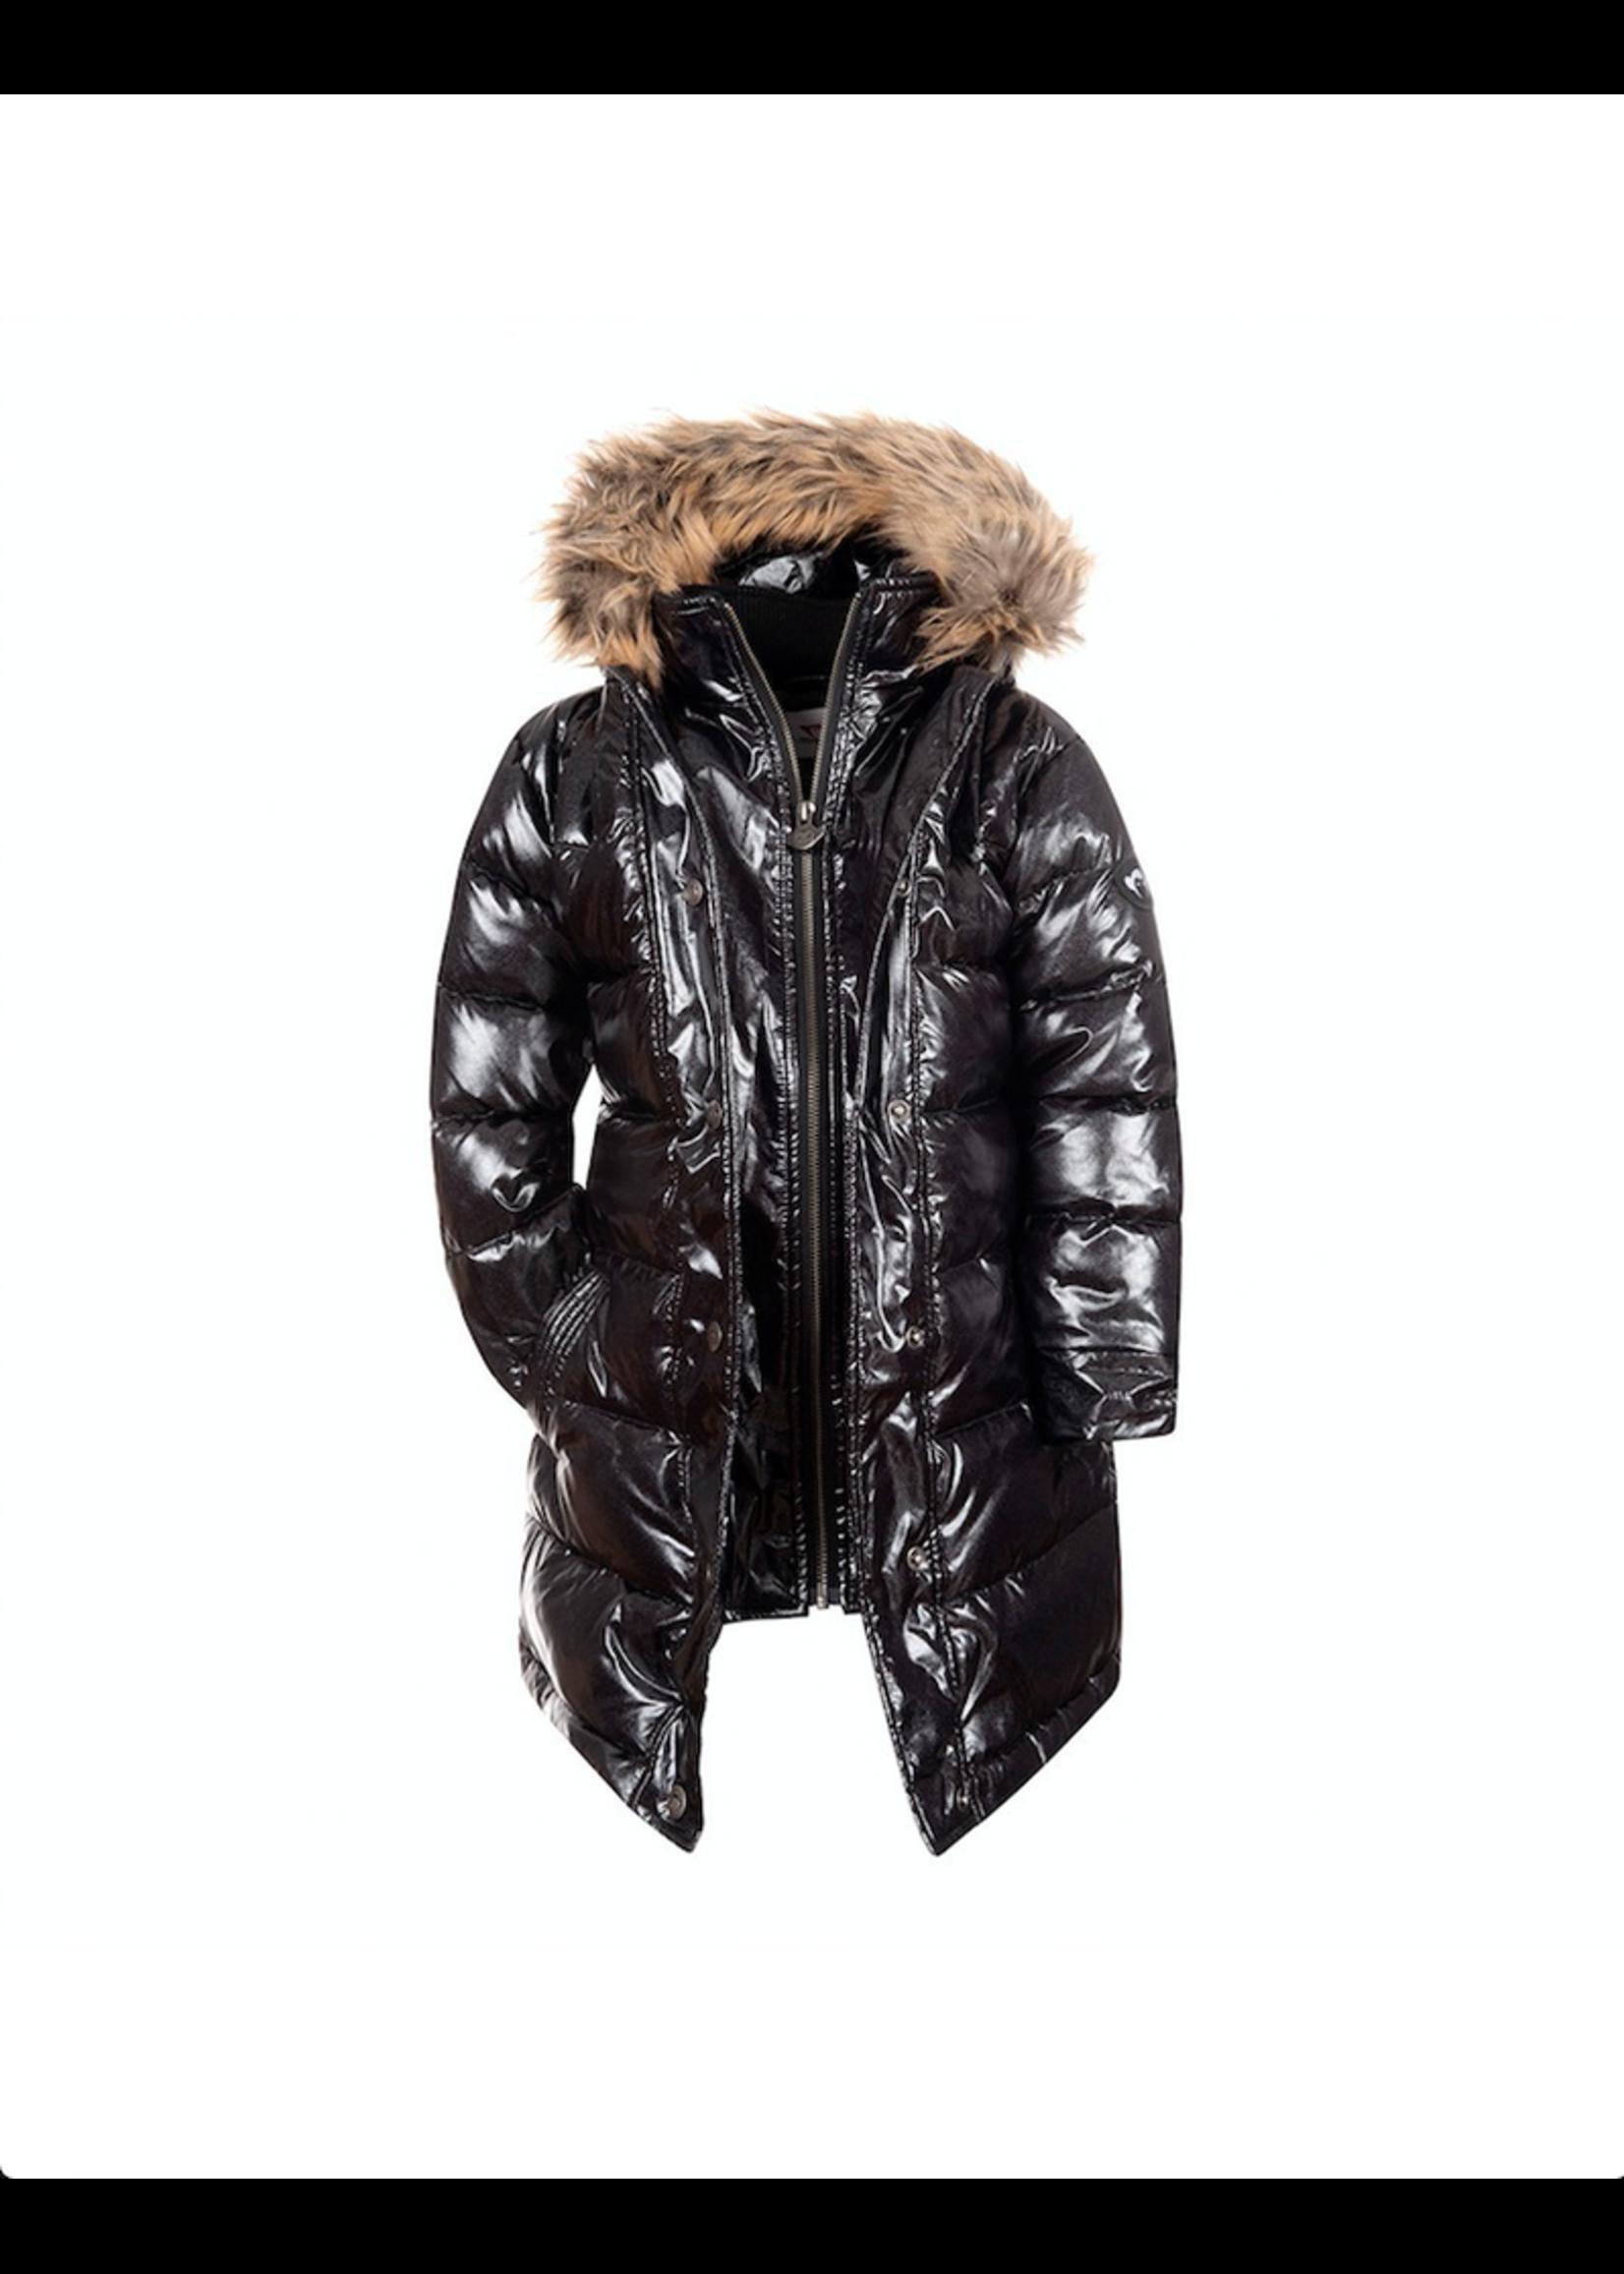 Appaman Appaman, Sparkle Black Long Down Coat